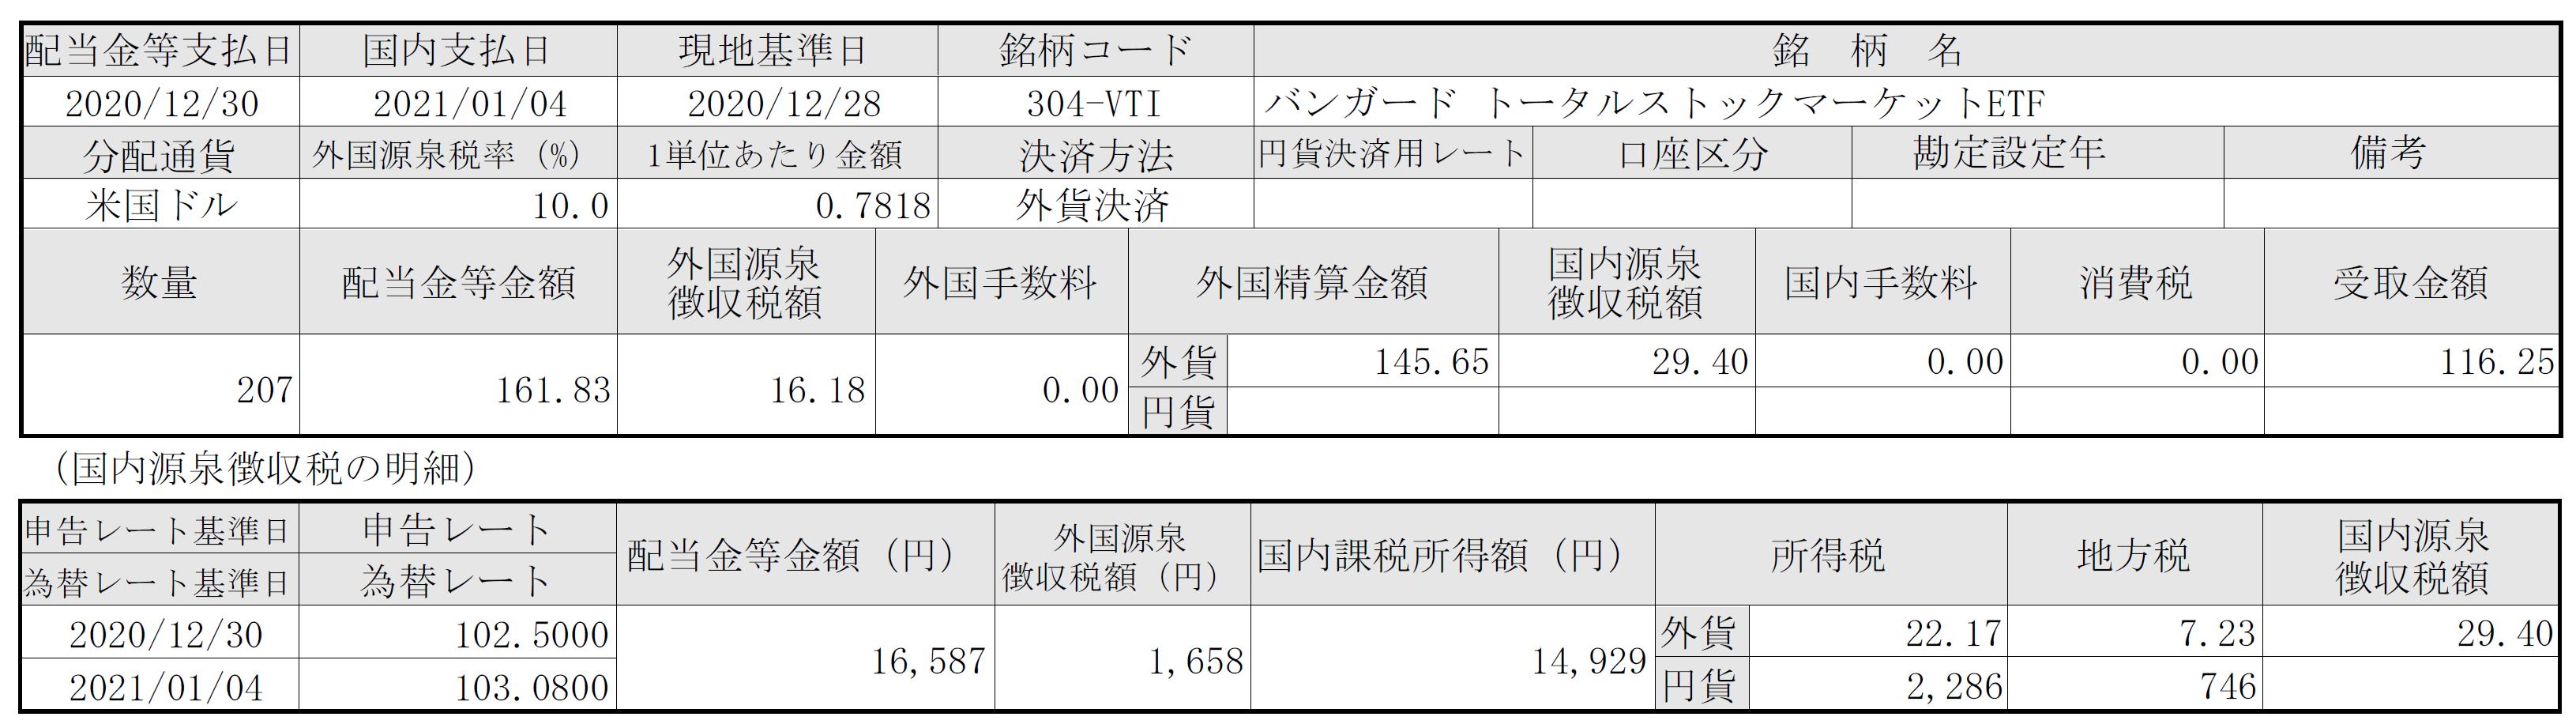 f:id:hodo-work:20210112105637p:plain